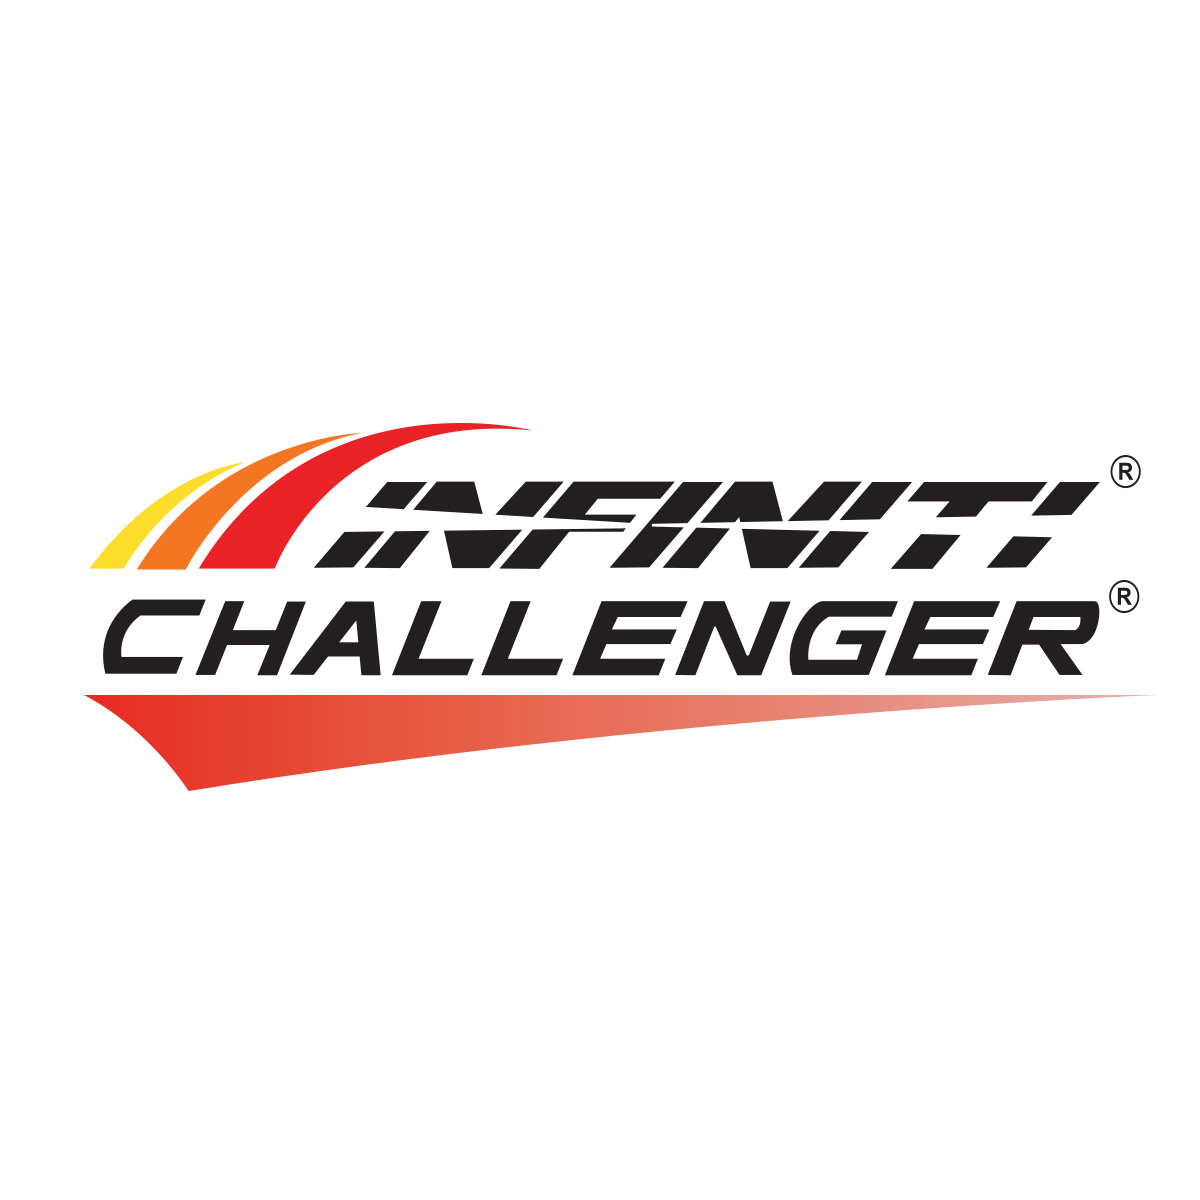 Infiniti Challenger